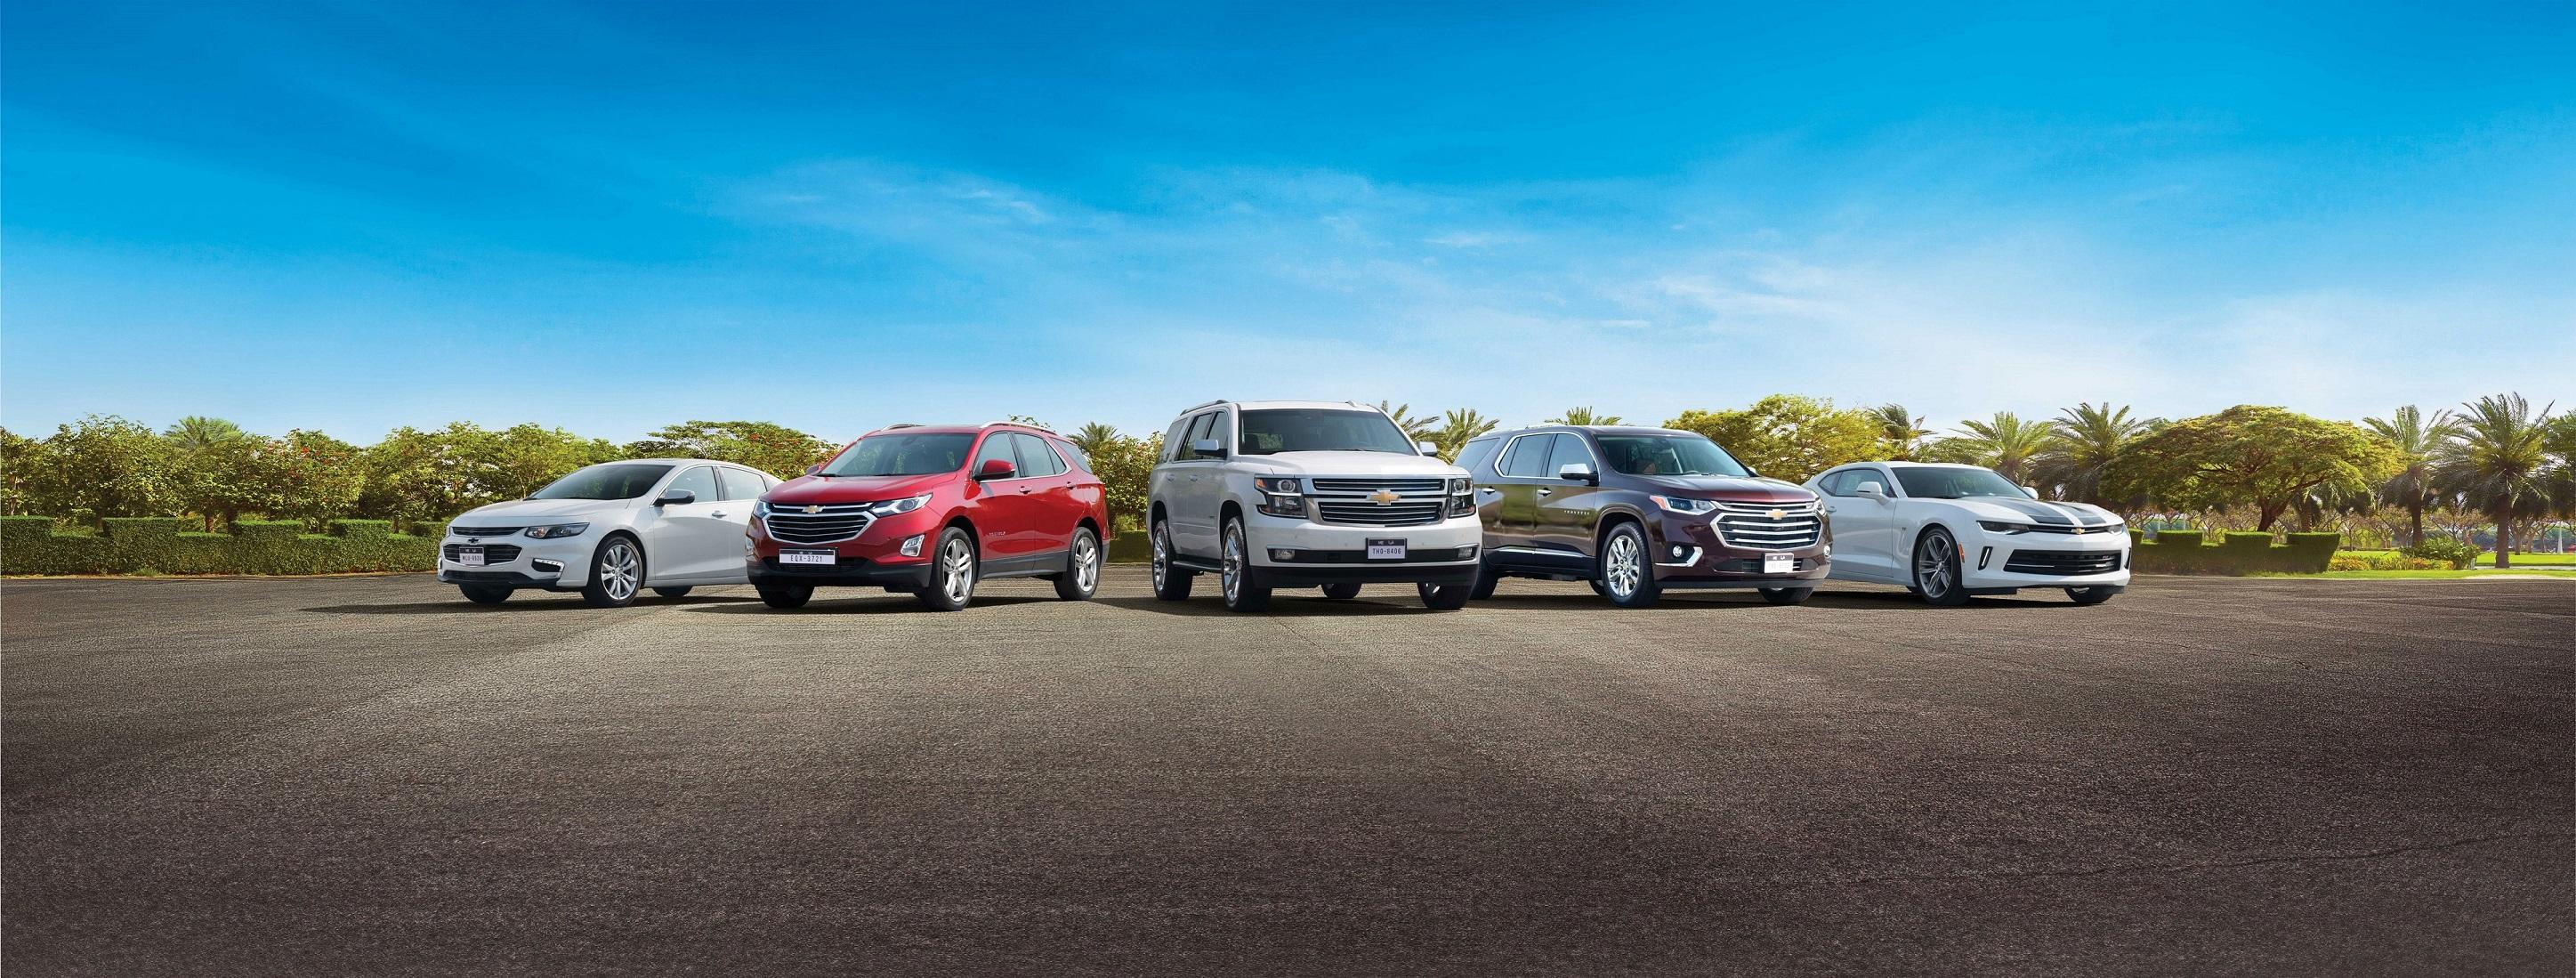 Chevrolet Confirms Best Ever Lineup Showcase At 2017 Dubai